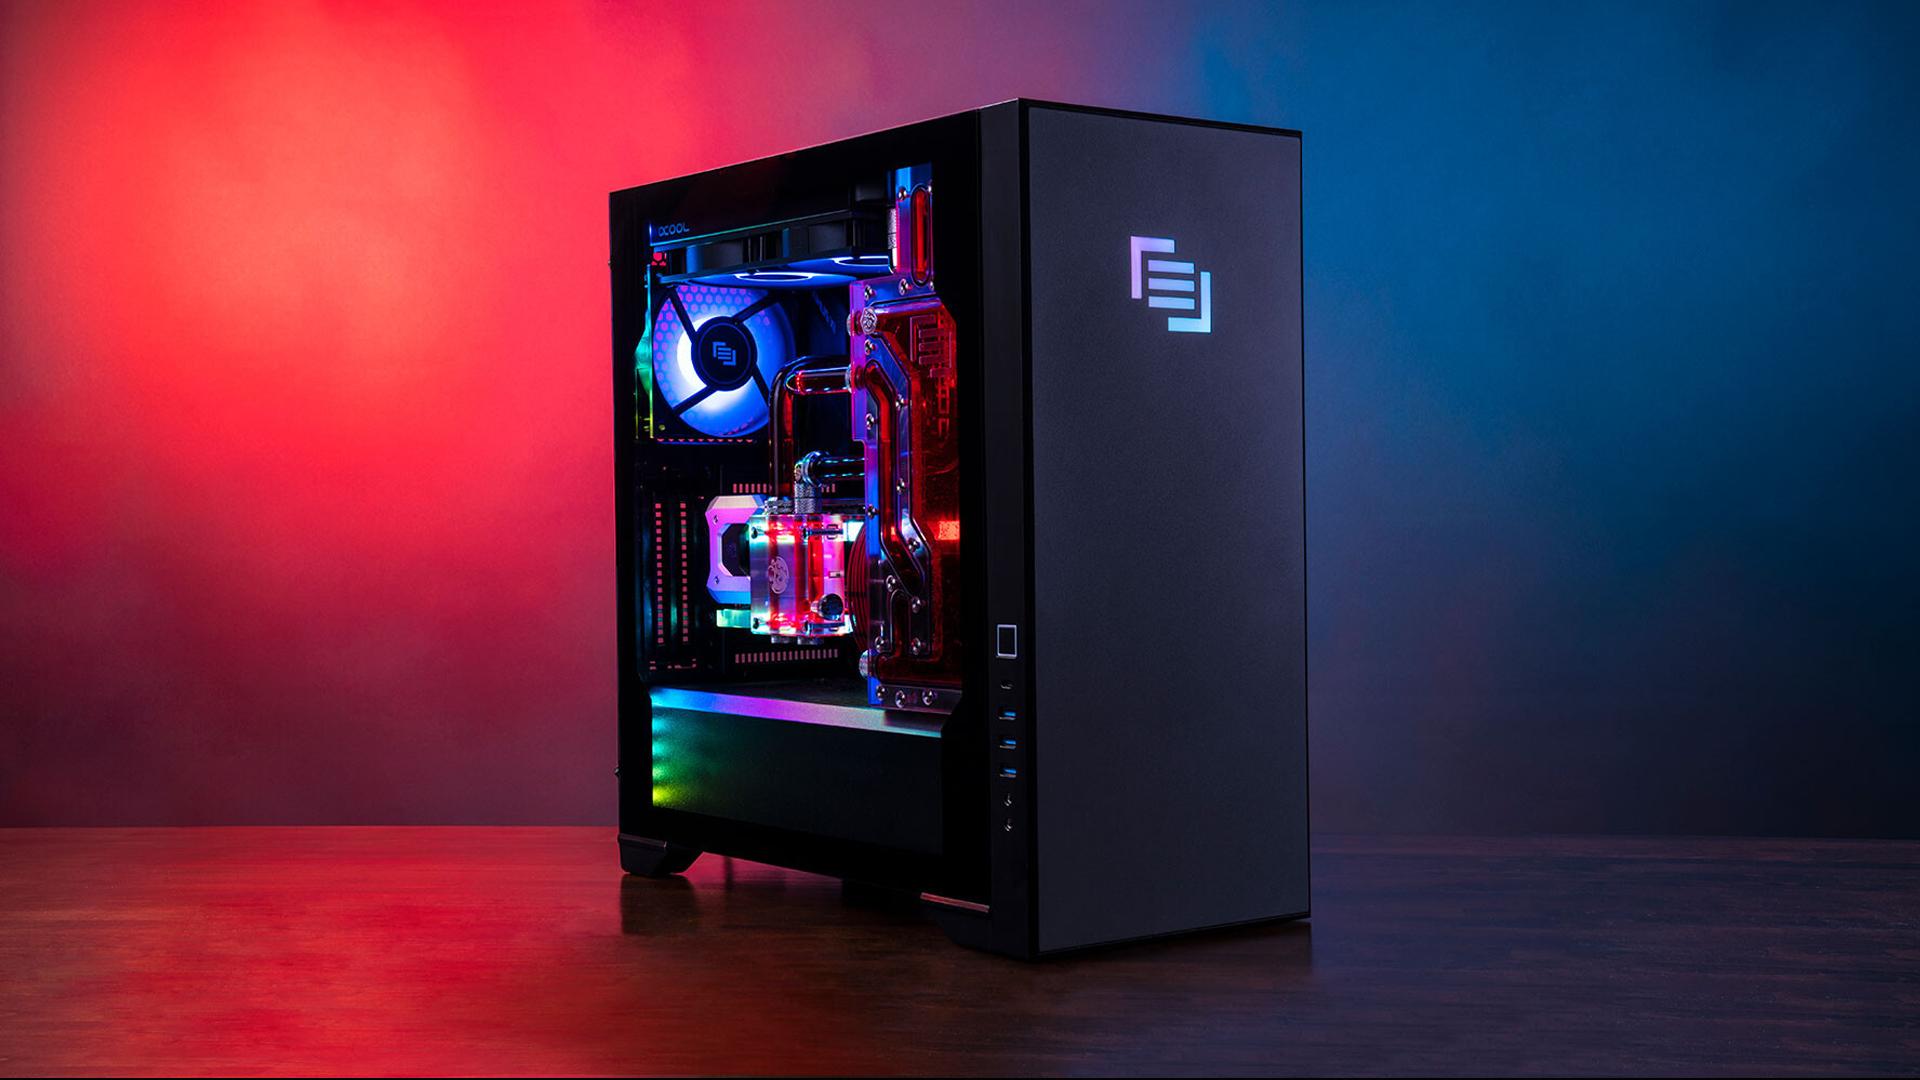 MAINGEAR Launches NVIDIA GeForce RTX 3080 Ti Desktops